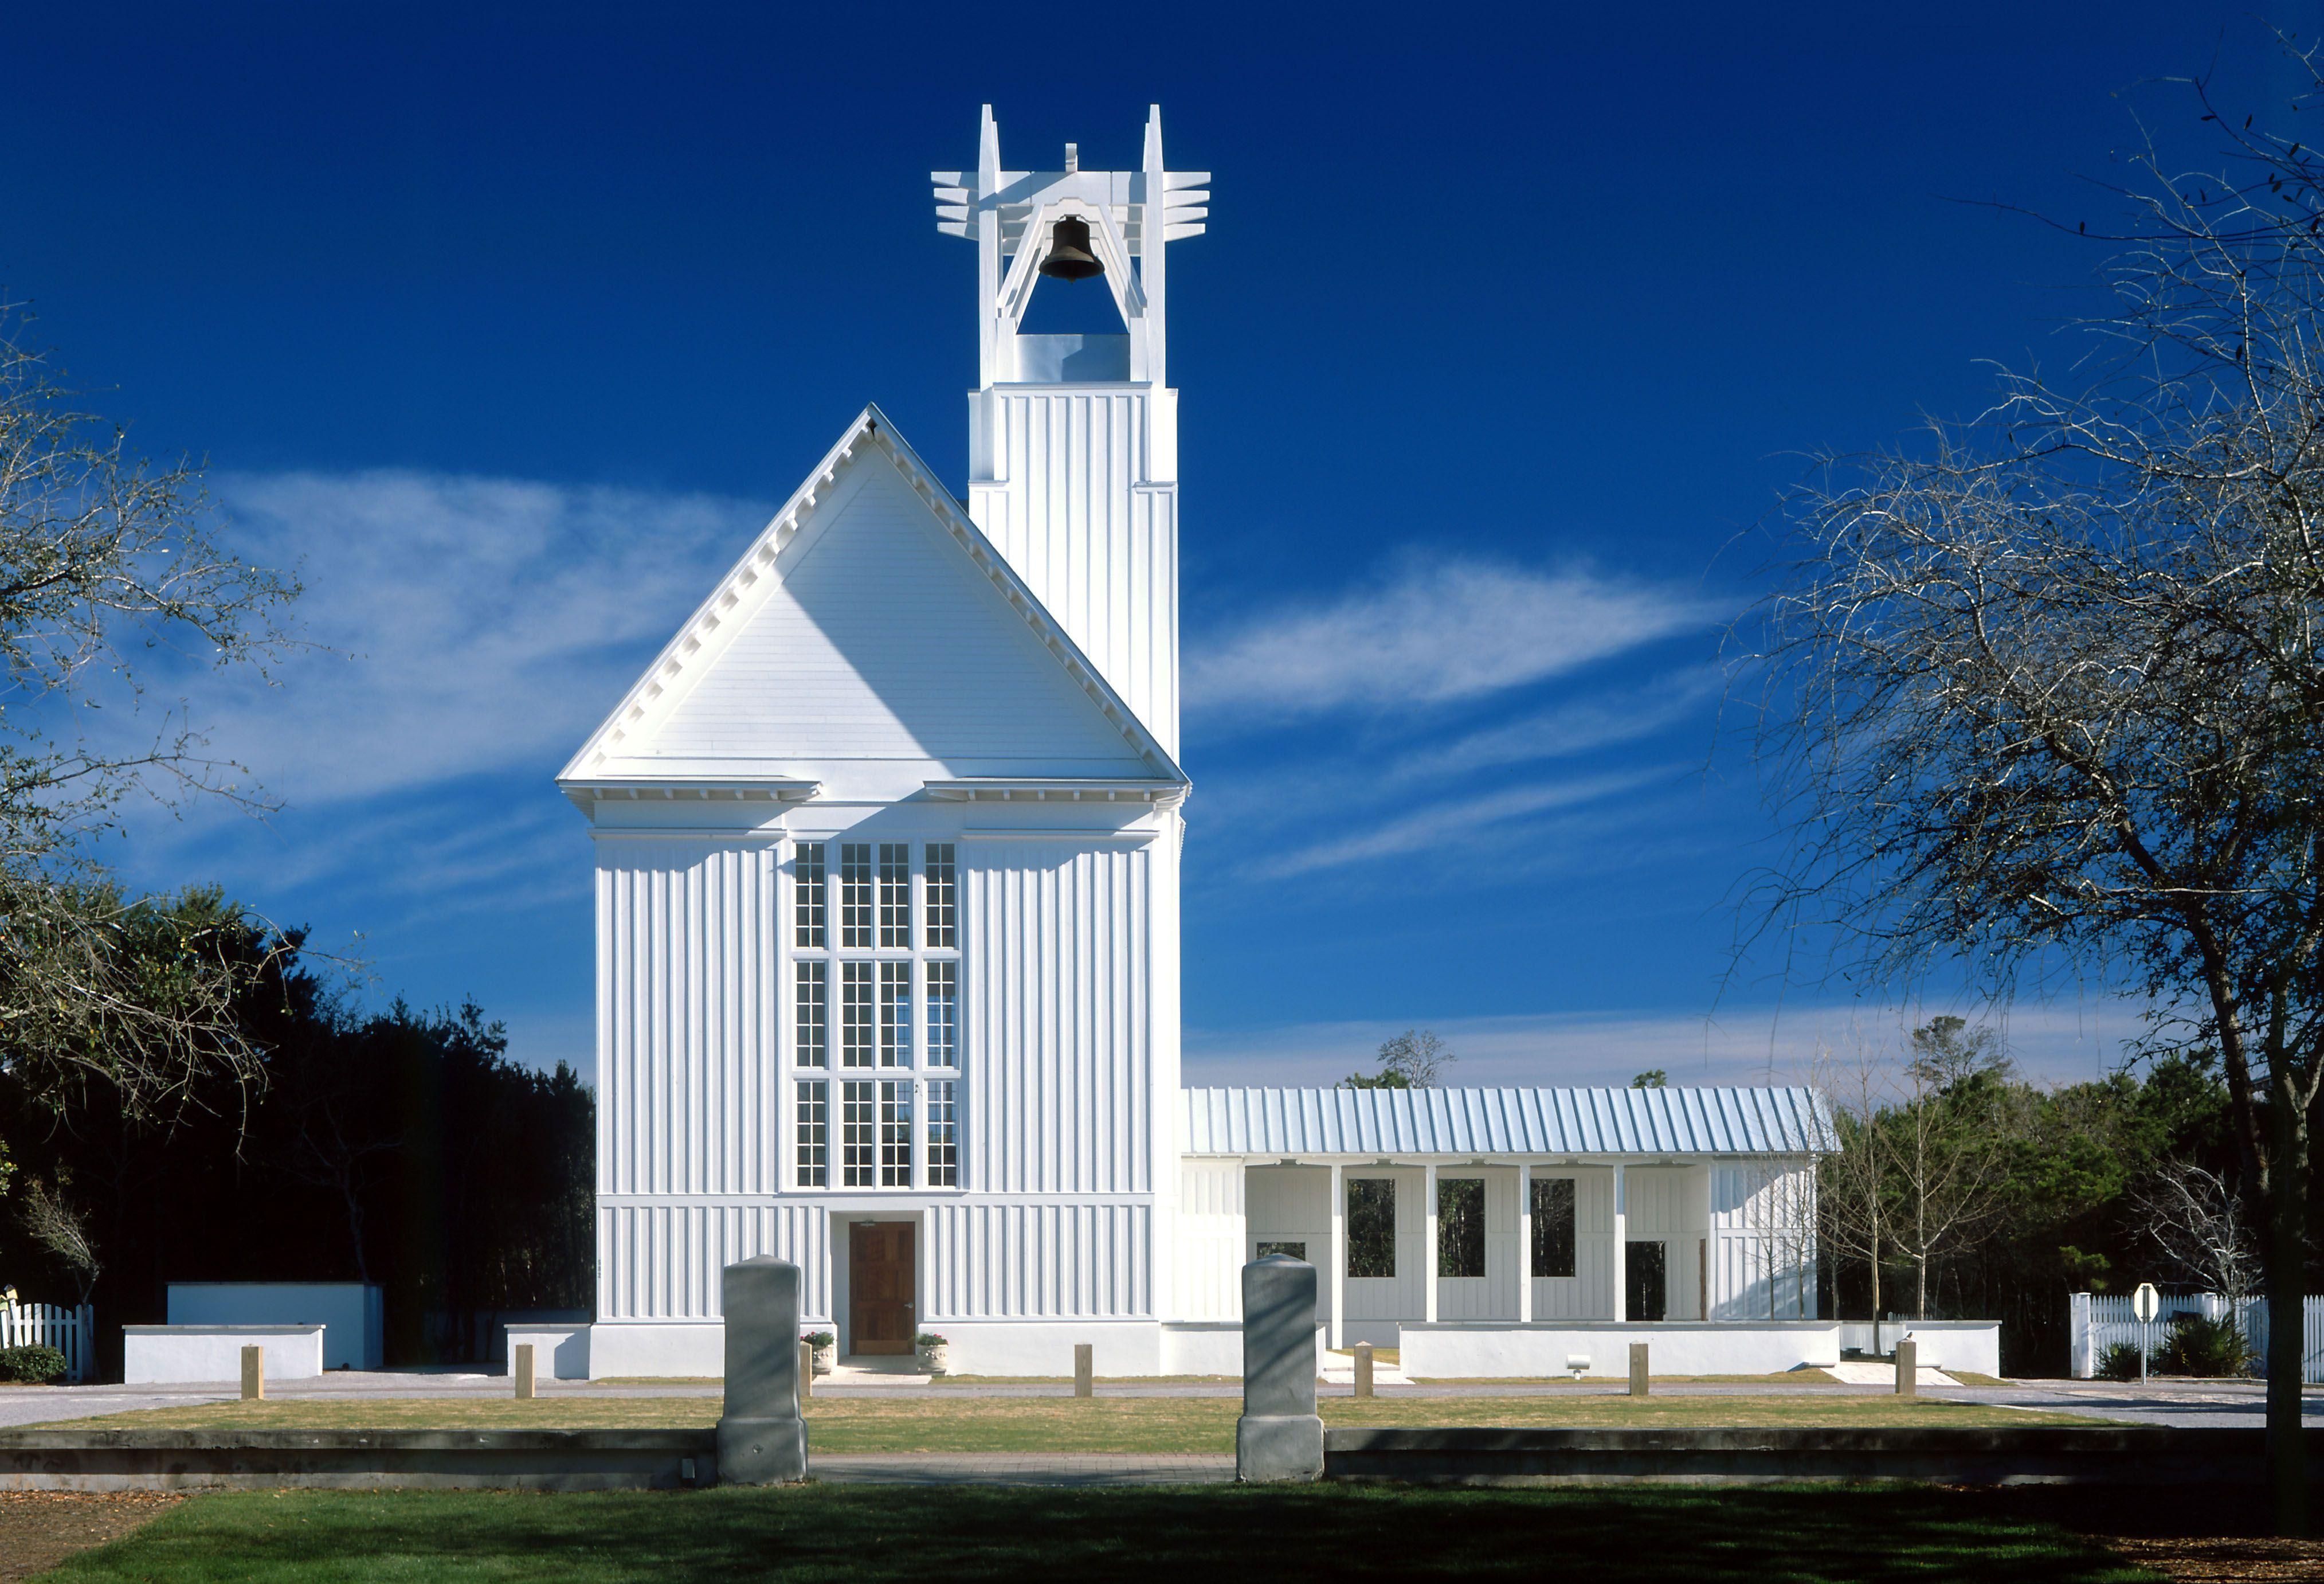 The Seaside Chapel | wedding venue | Seaside, Florida photo credit ...